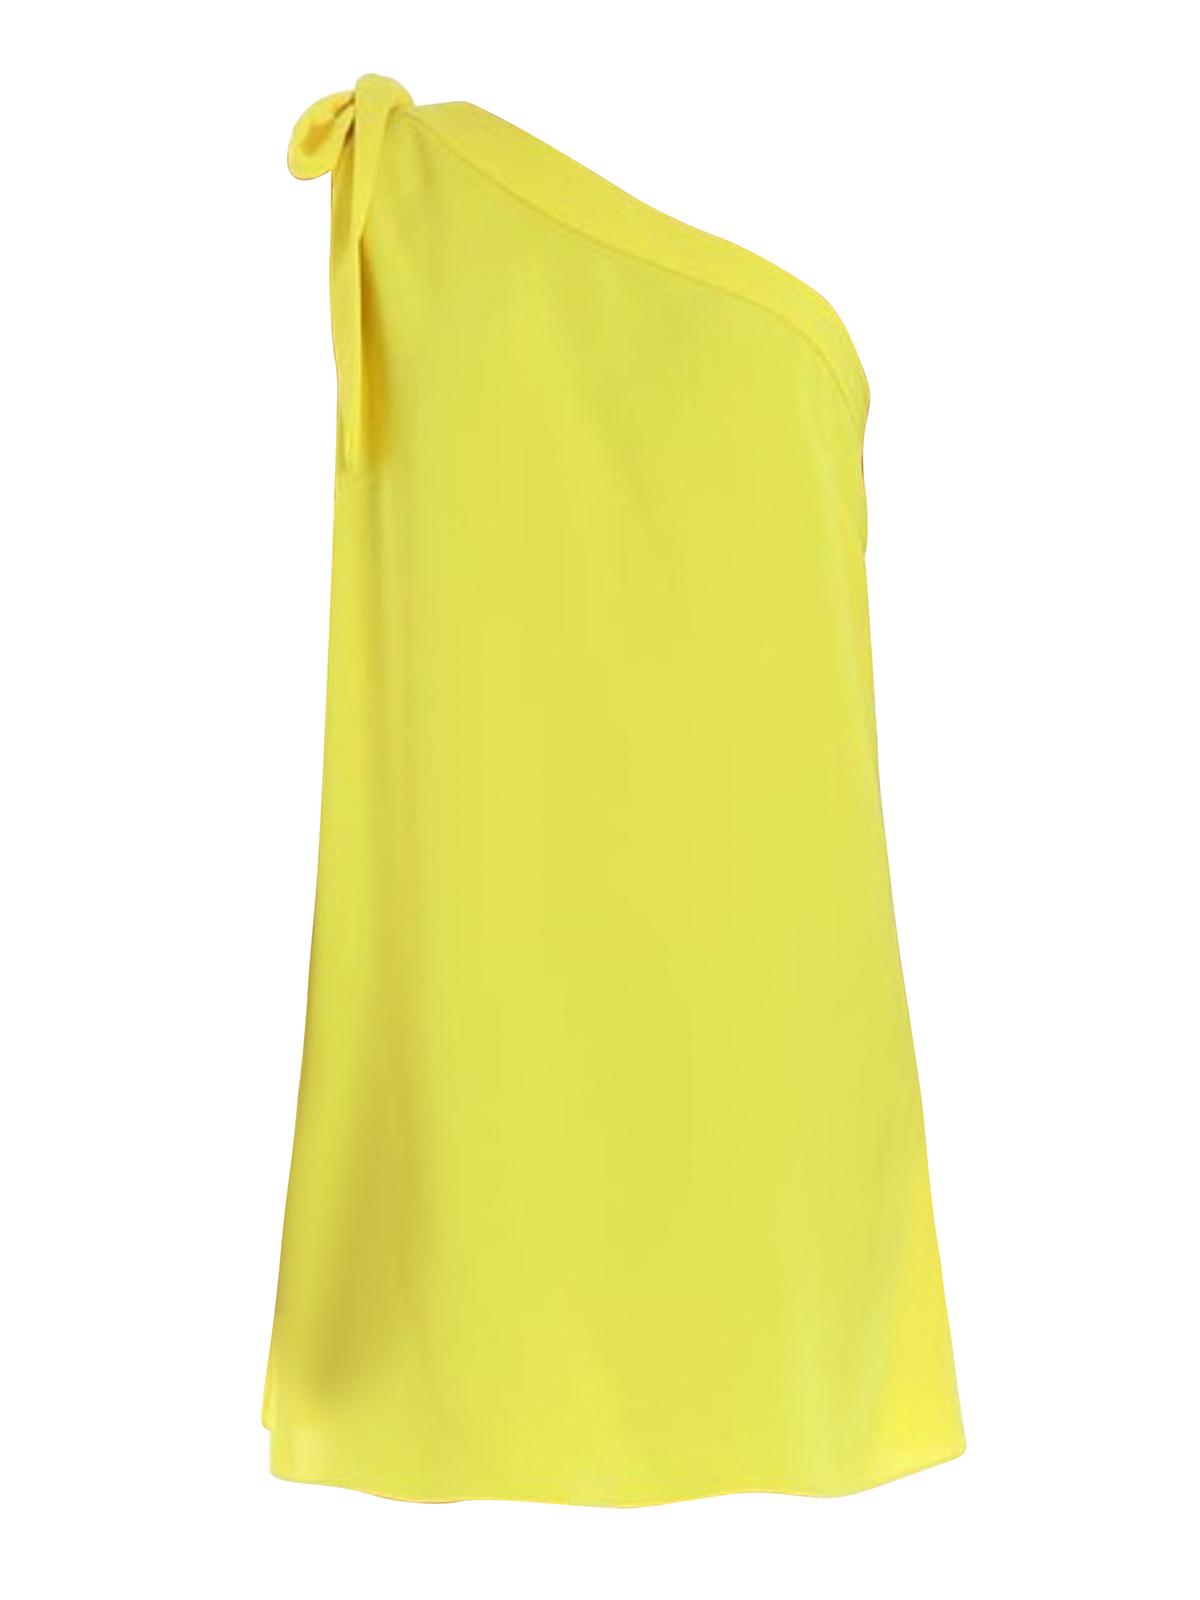 check out 465fb c6a10 P.A.R.O.S.H. - Abito monospalla giallo Pantery - abiti corti ...